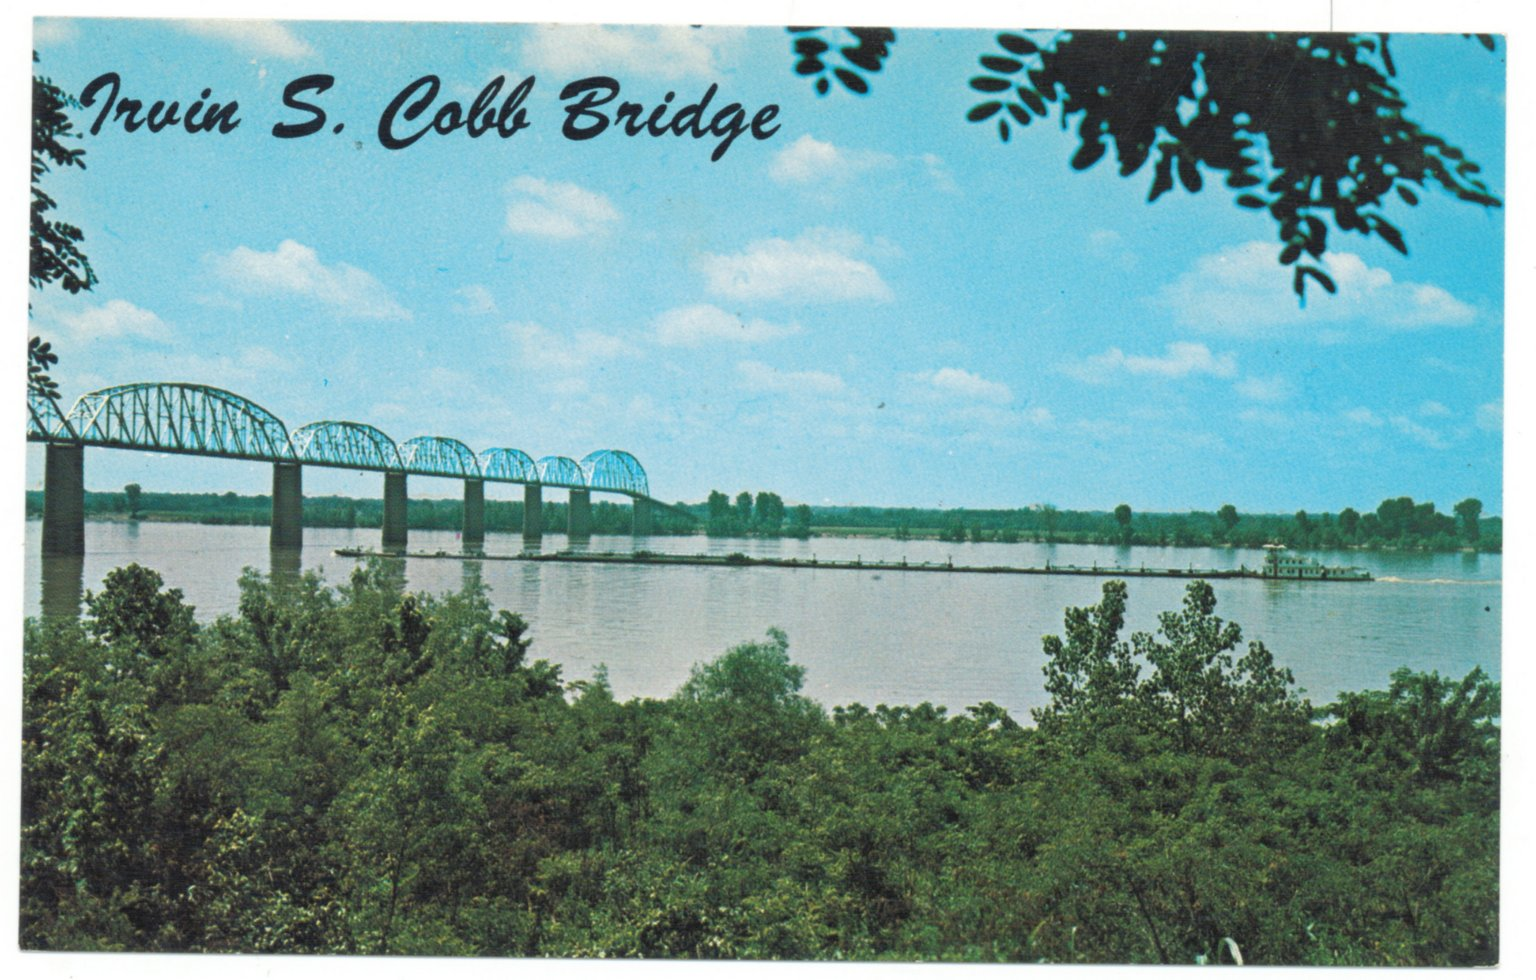 Irvin S. Cobb Bridge